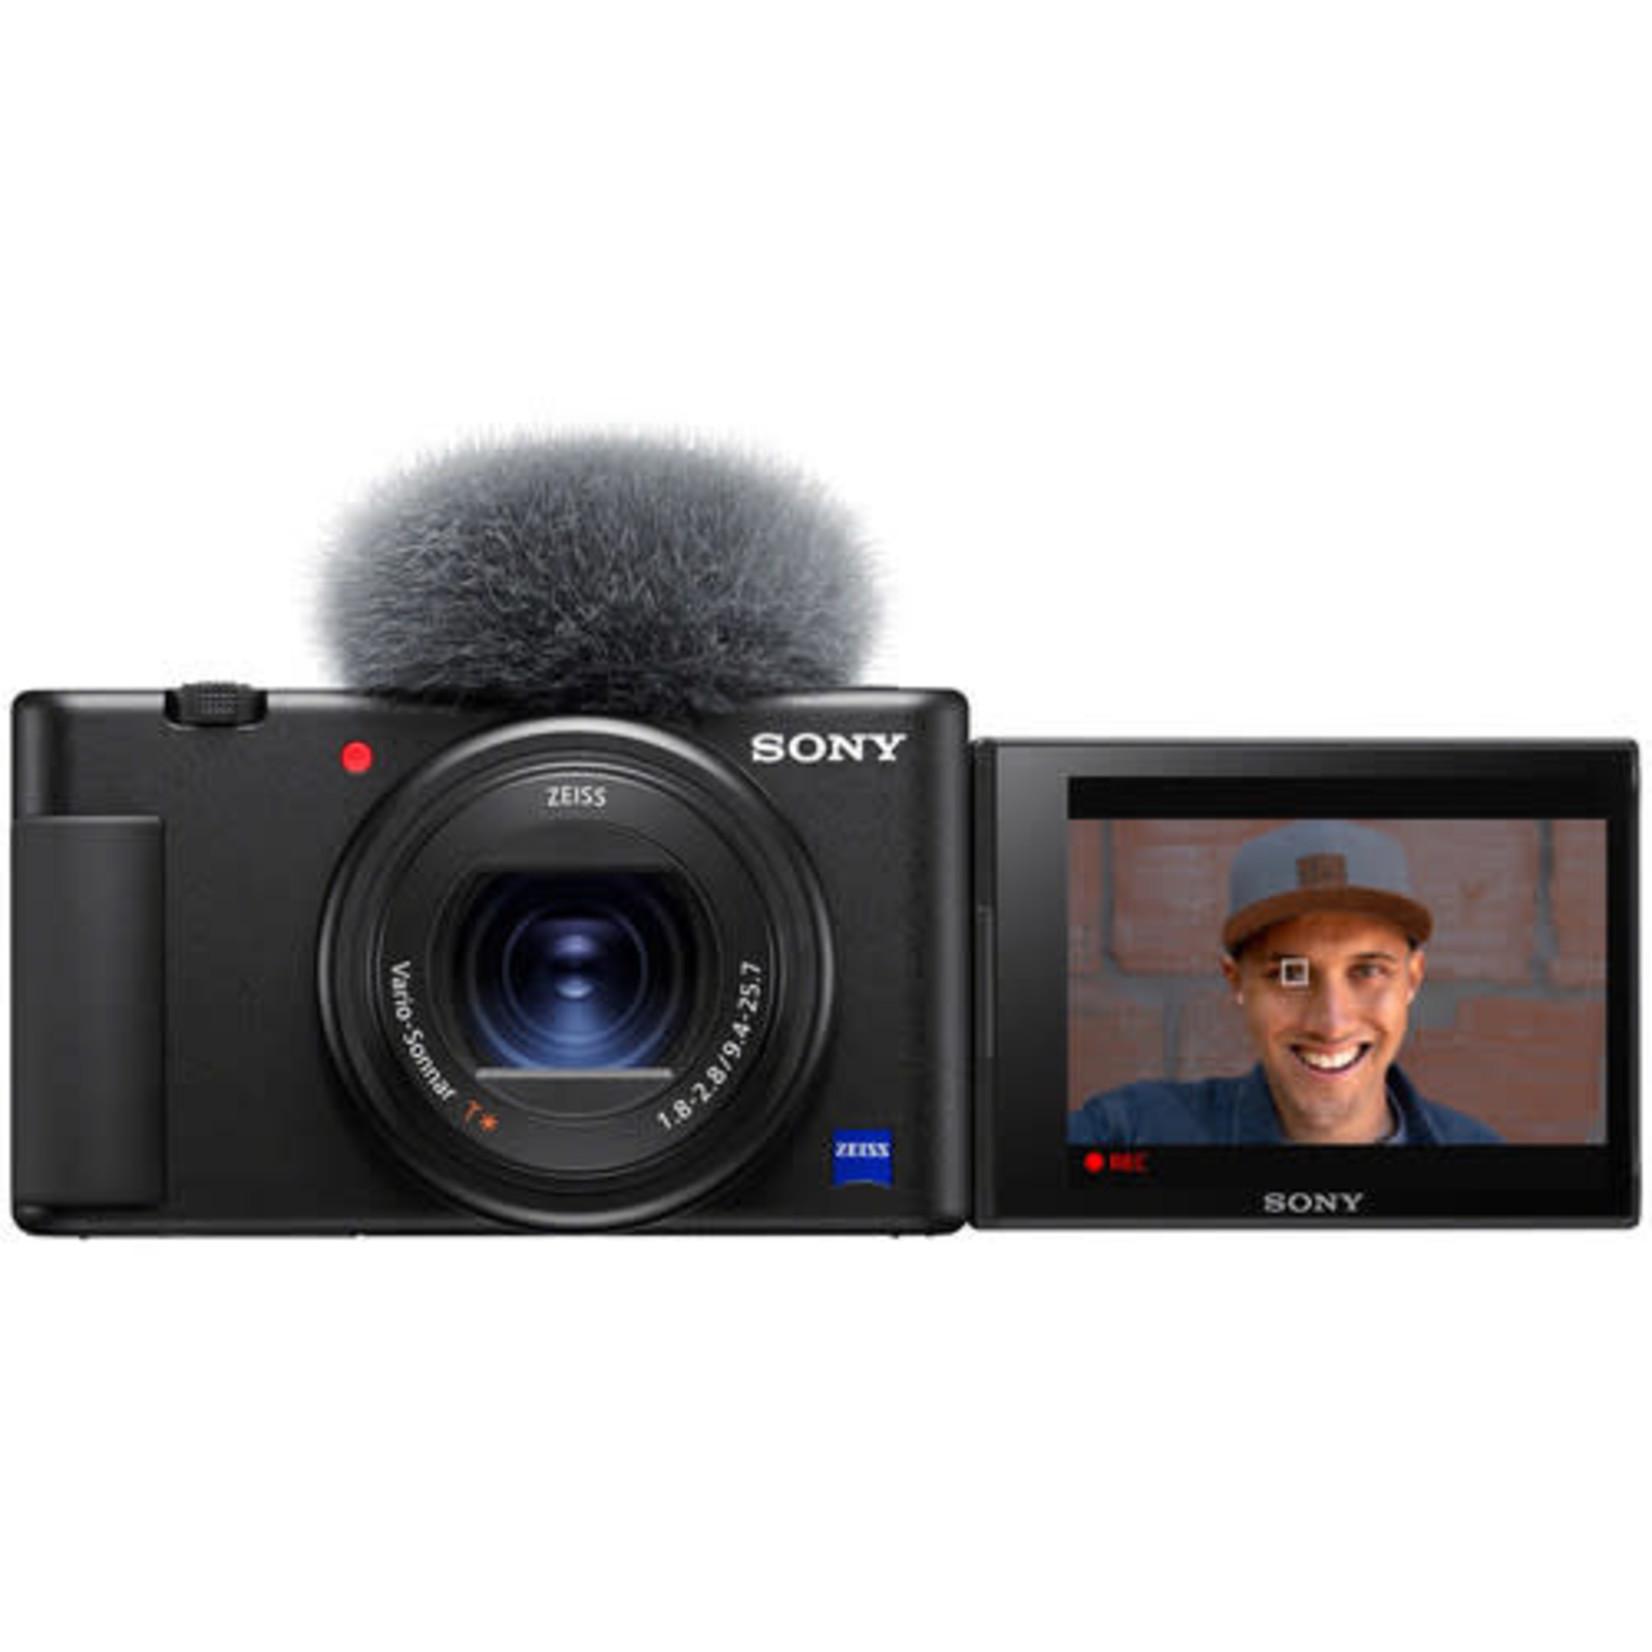 Sony Sony ZV-1 Digital Camera